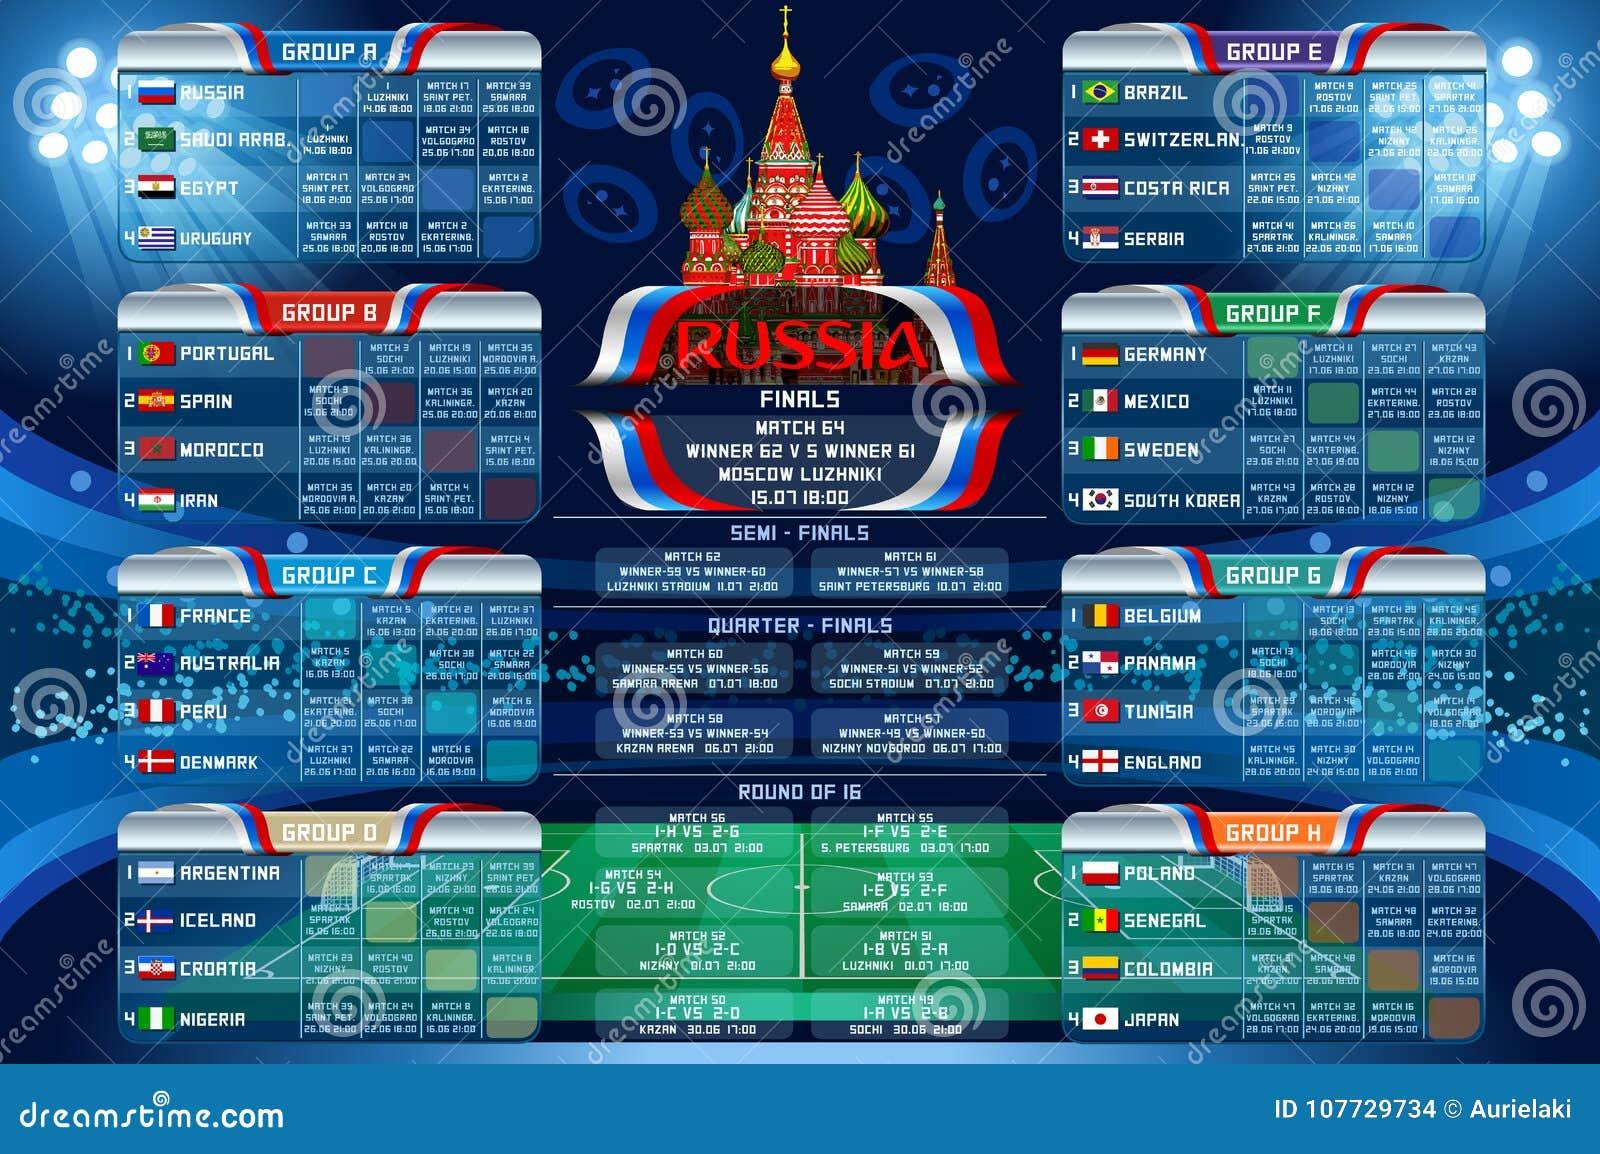 Coupe Du Monde De Football Calendrier.Banniere De Web De Calendrier De Coupe Du Monde De La Russie